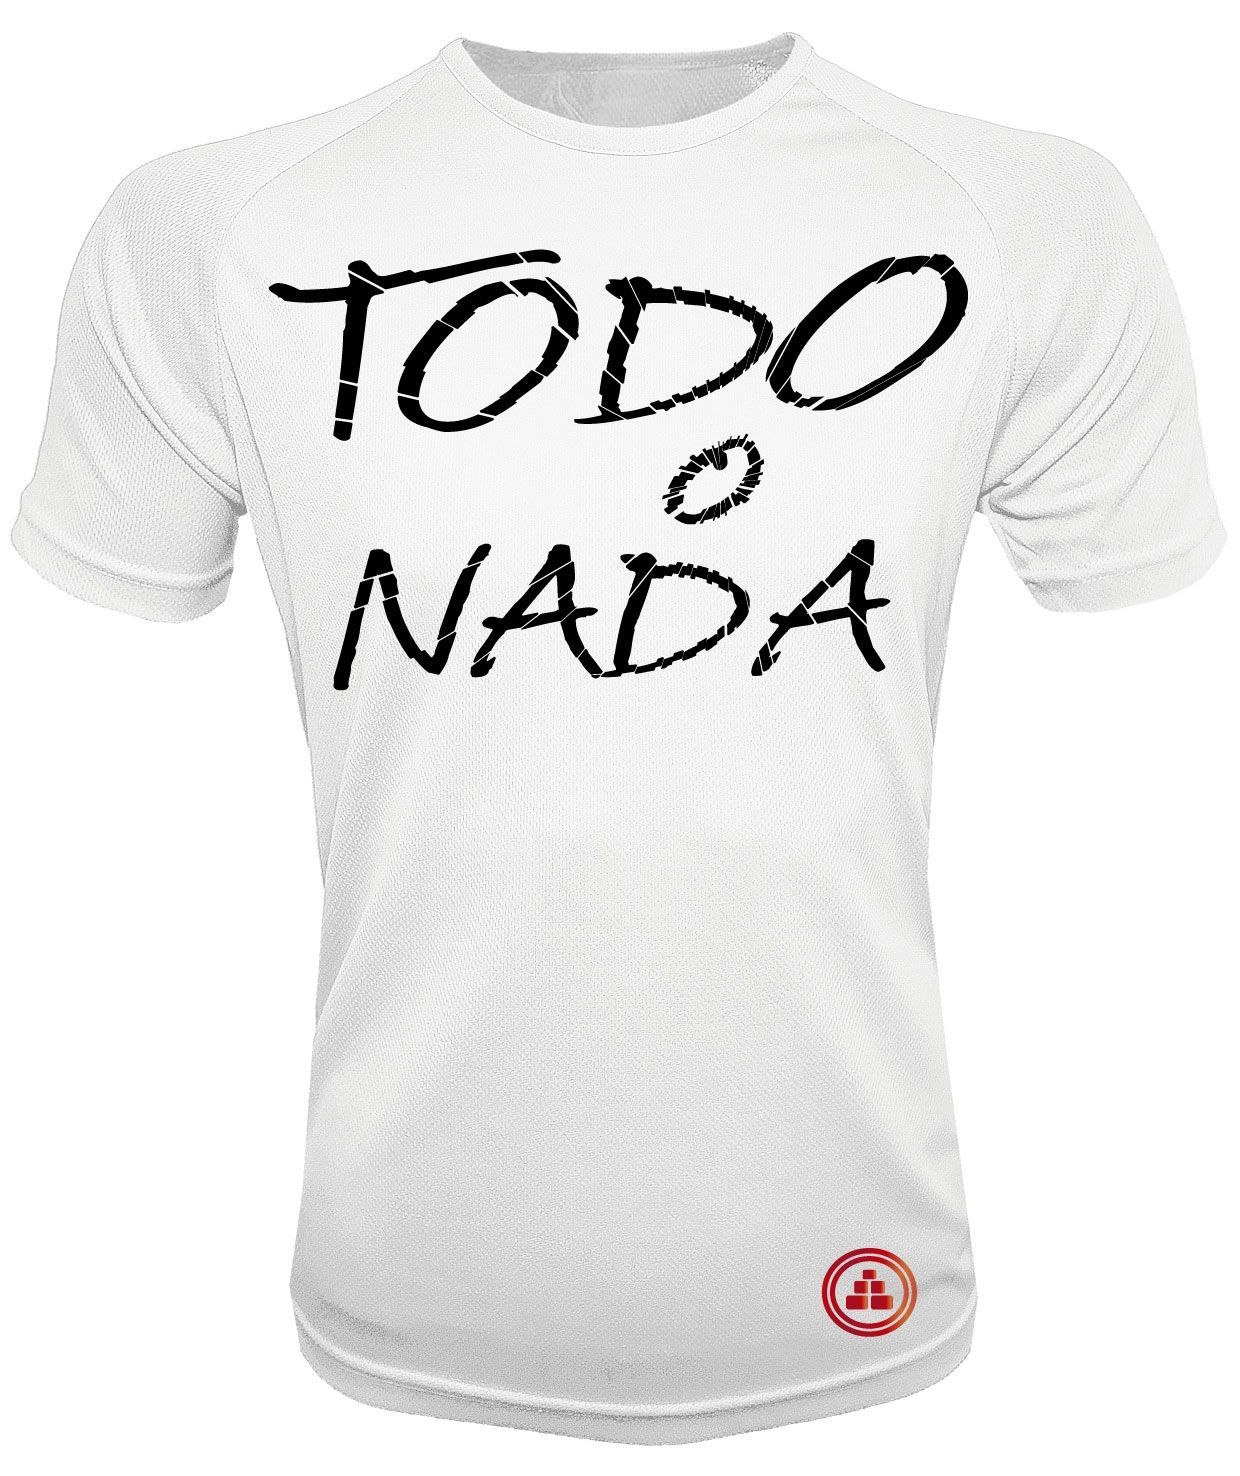 Camiseta de deporte todo o nada B